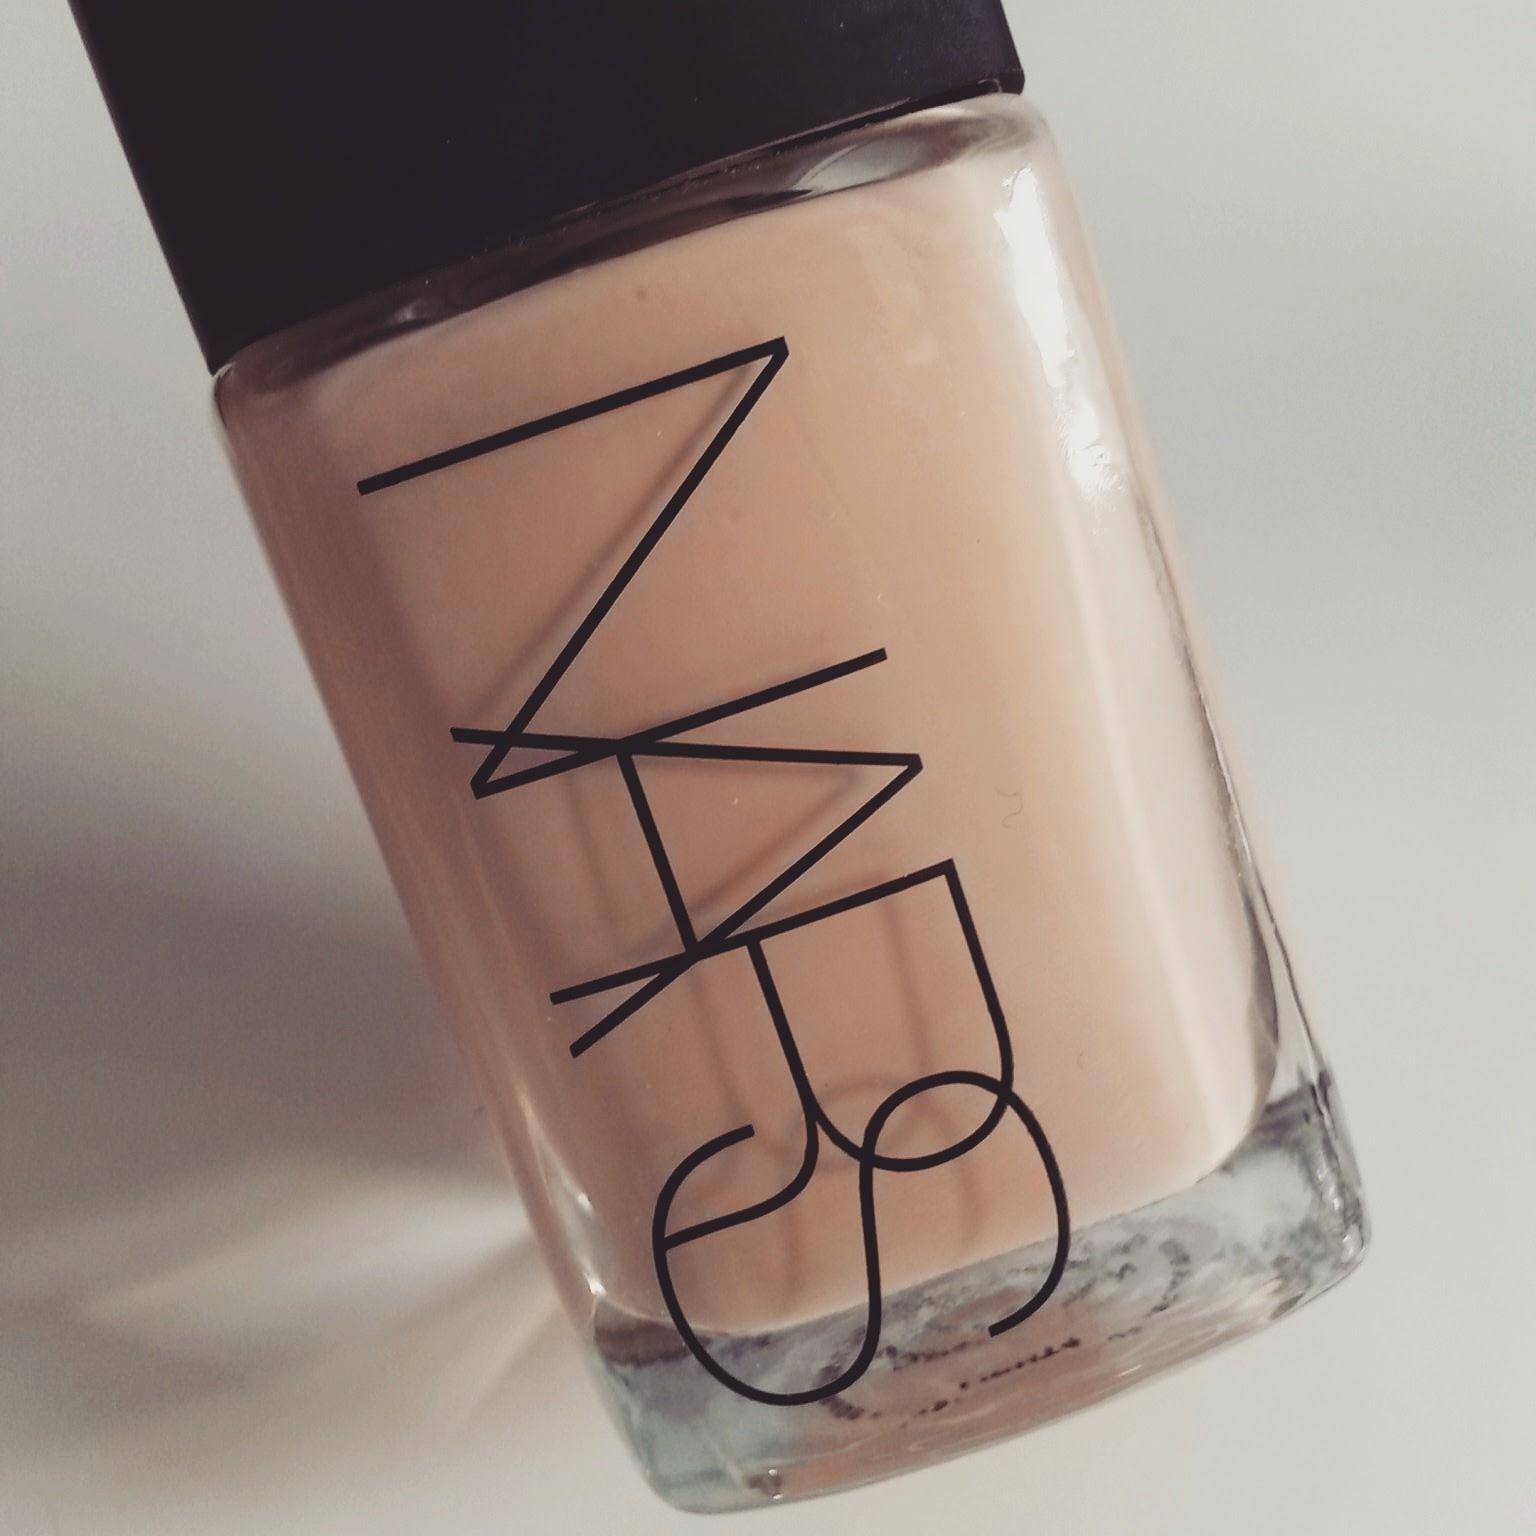 beauty makeup regrets 2015 - NARS sheer glow foundation